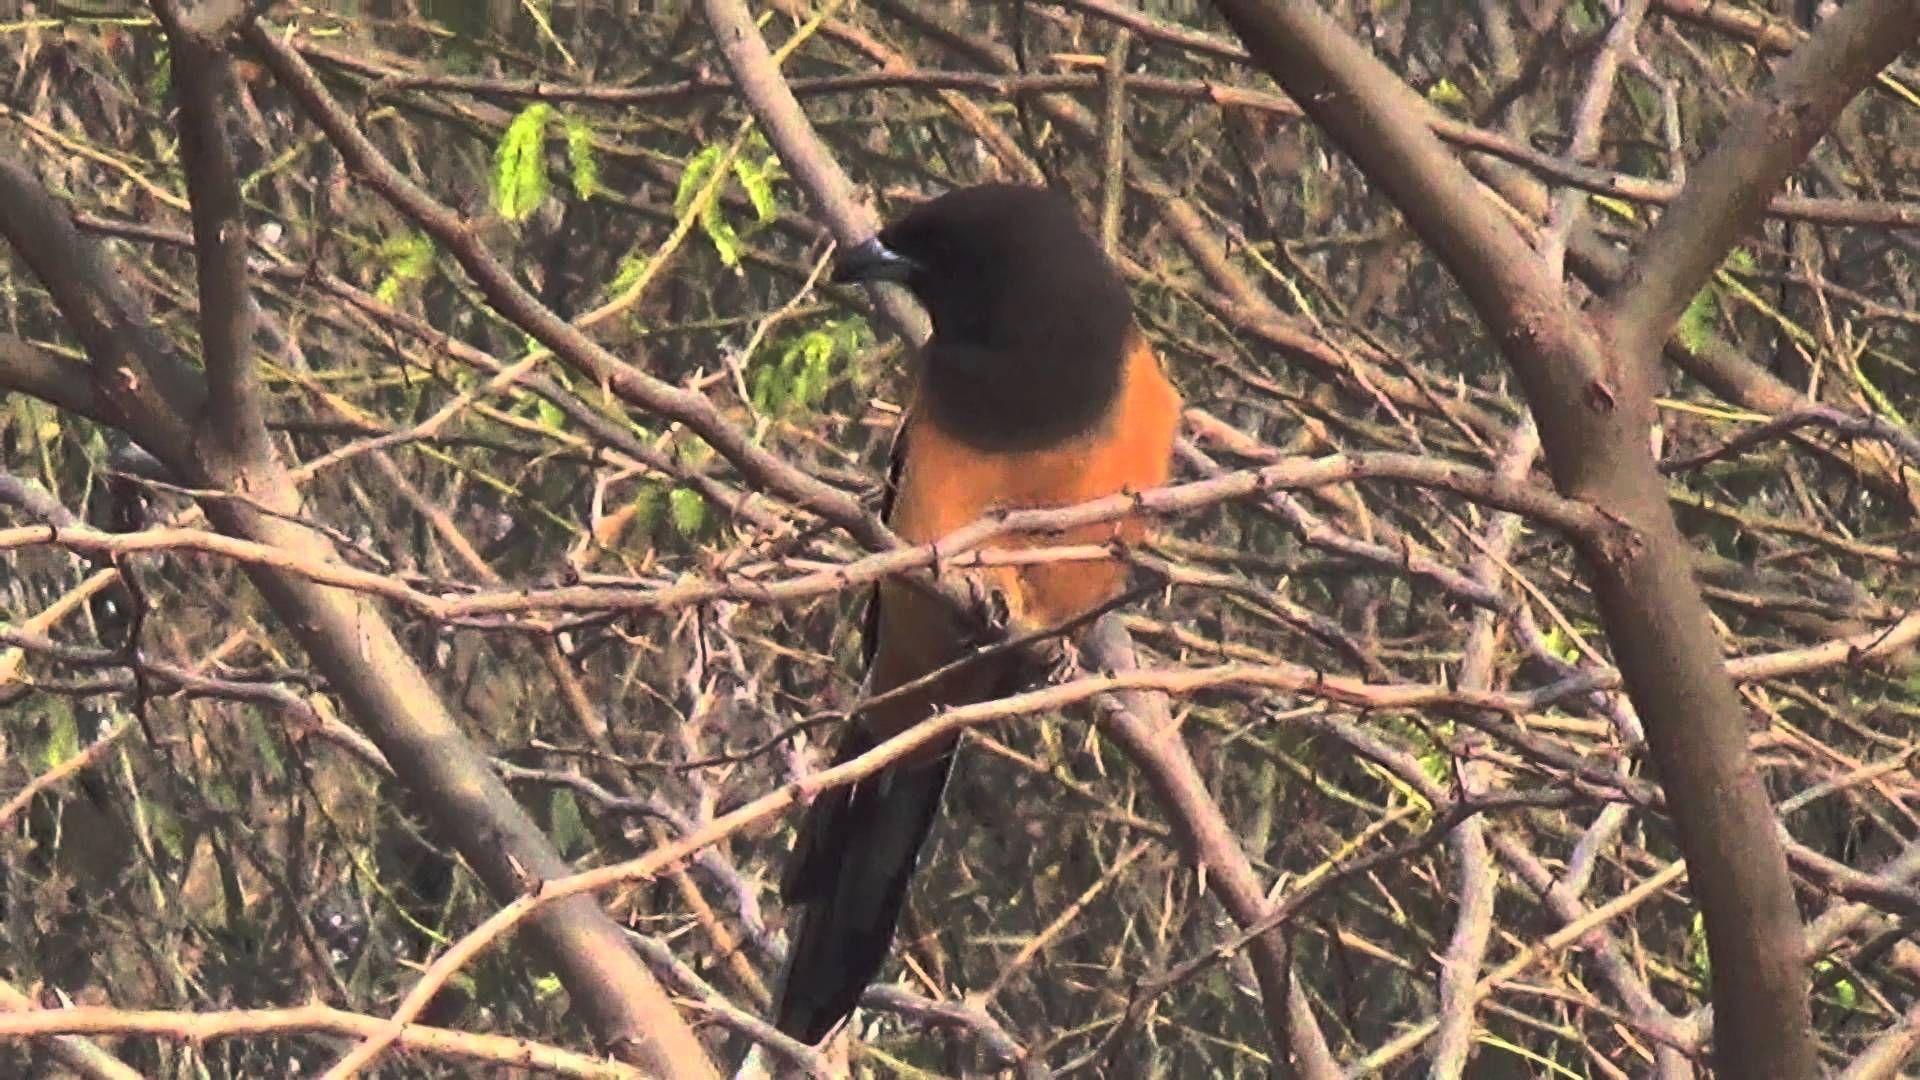 Rufous Treepie (SHRIKANT MADHAV KELKAR) (With images